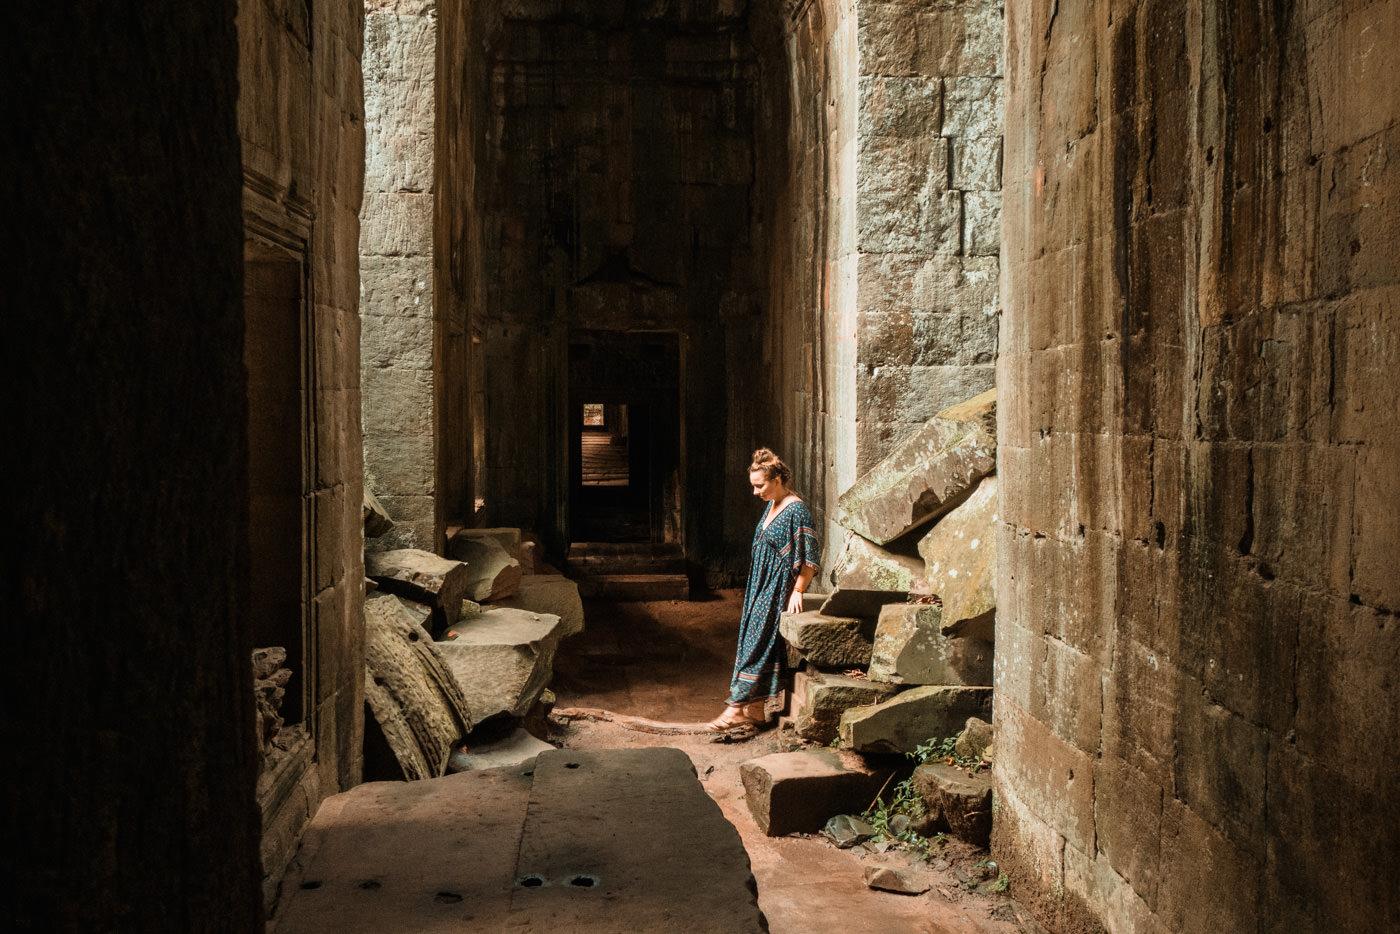 Julia im Tempel, Angkot War, Kambodscha